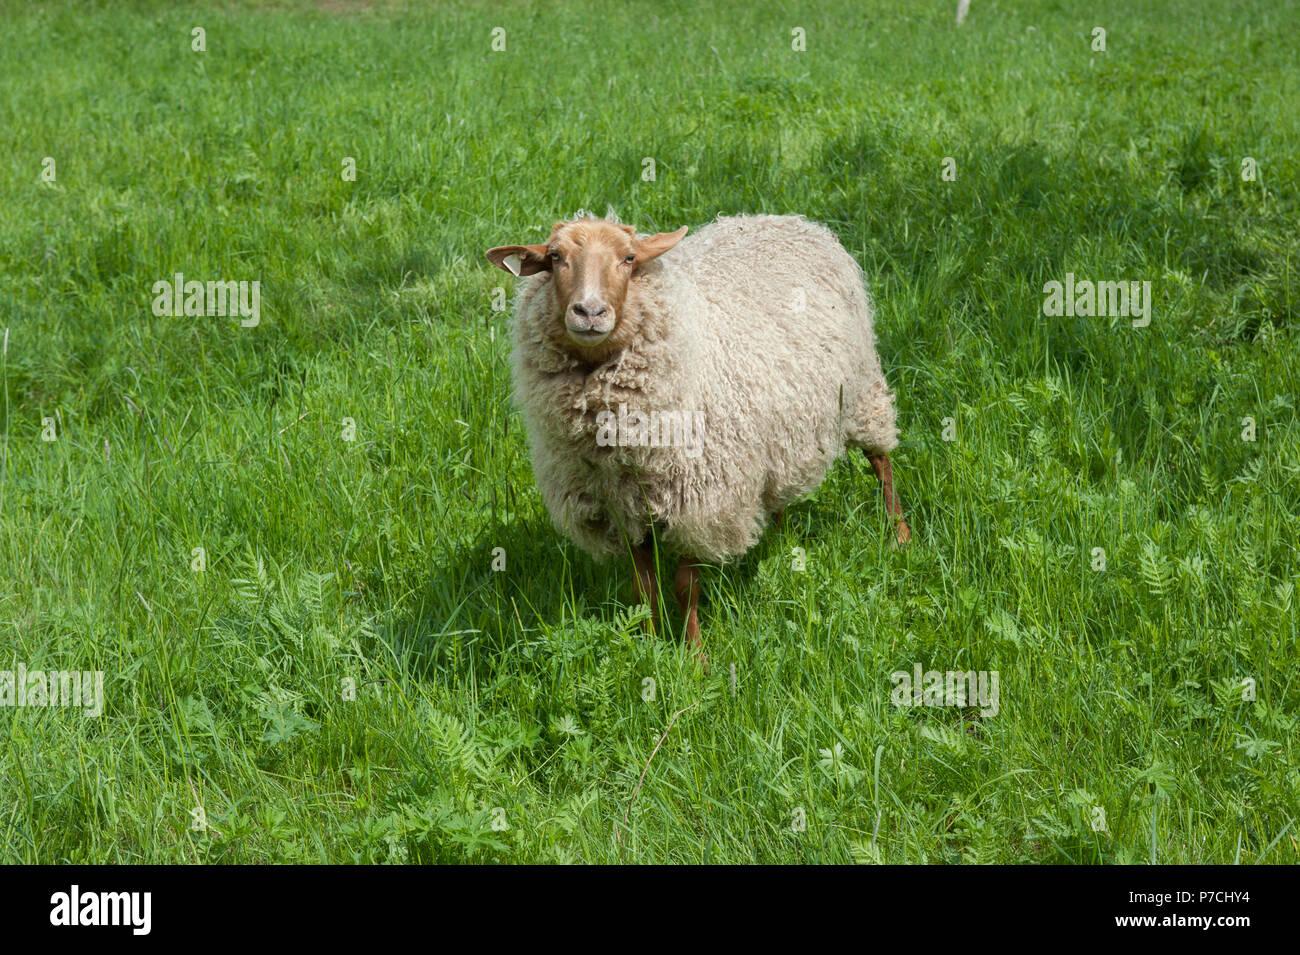 Coburg Fox Sheep, Schwaebisch Hall, Hohenlohe region, Baden-Wuerttemberg, Heilbronn-Franconia, Germany - Stock Image